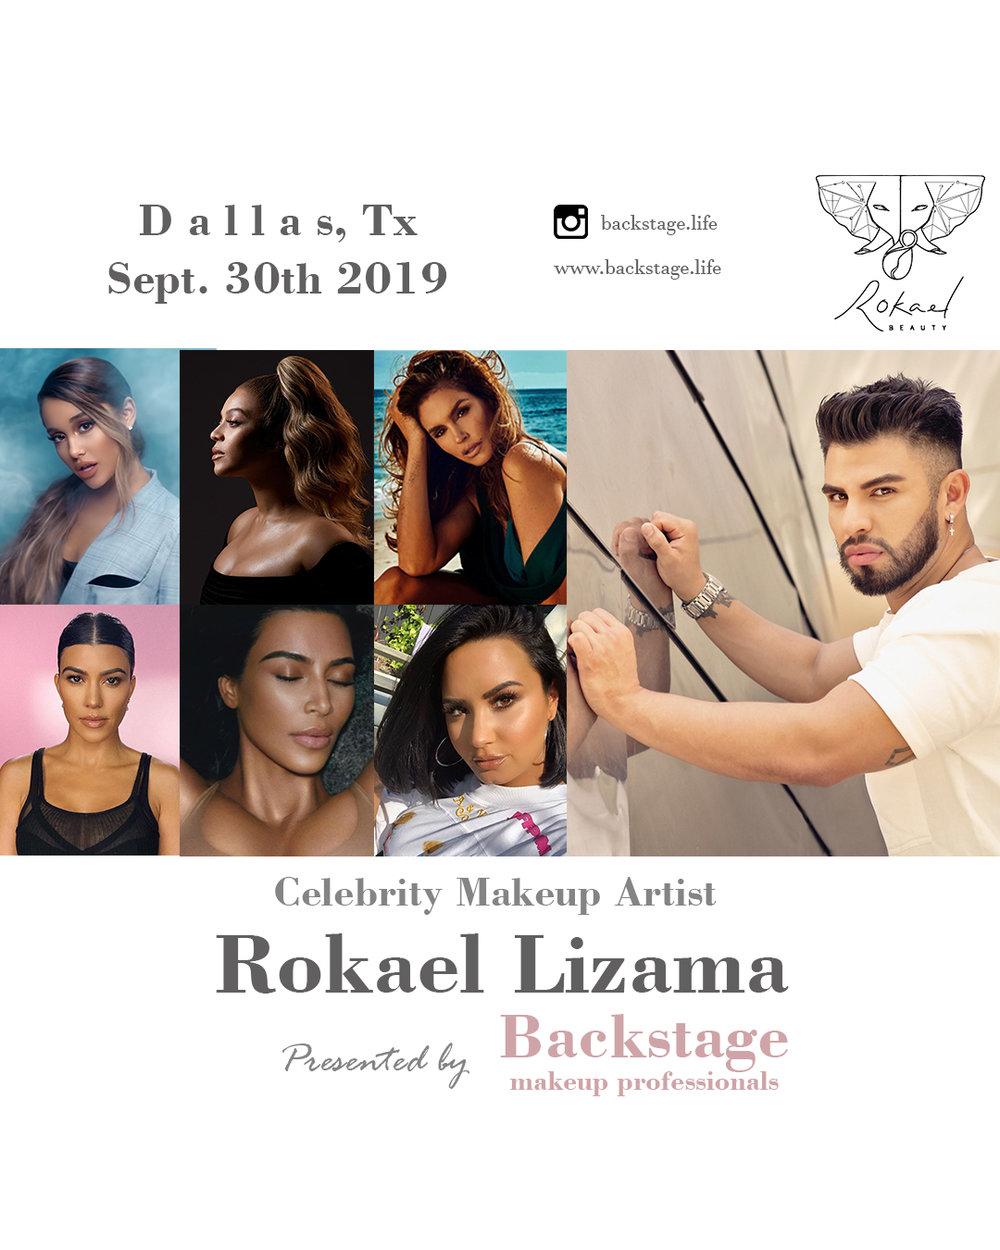 Makeup Professionals — Backstage